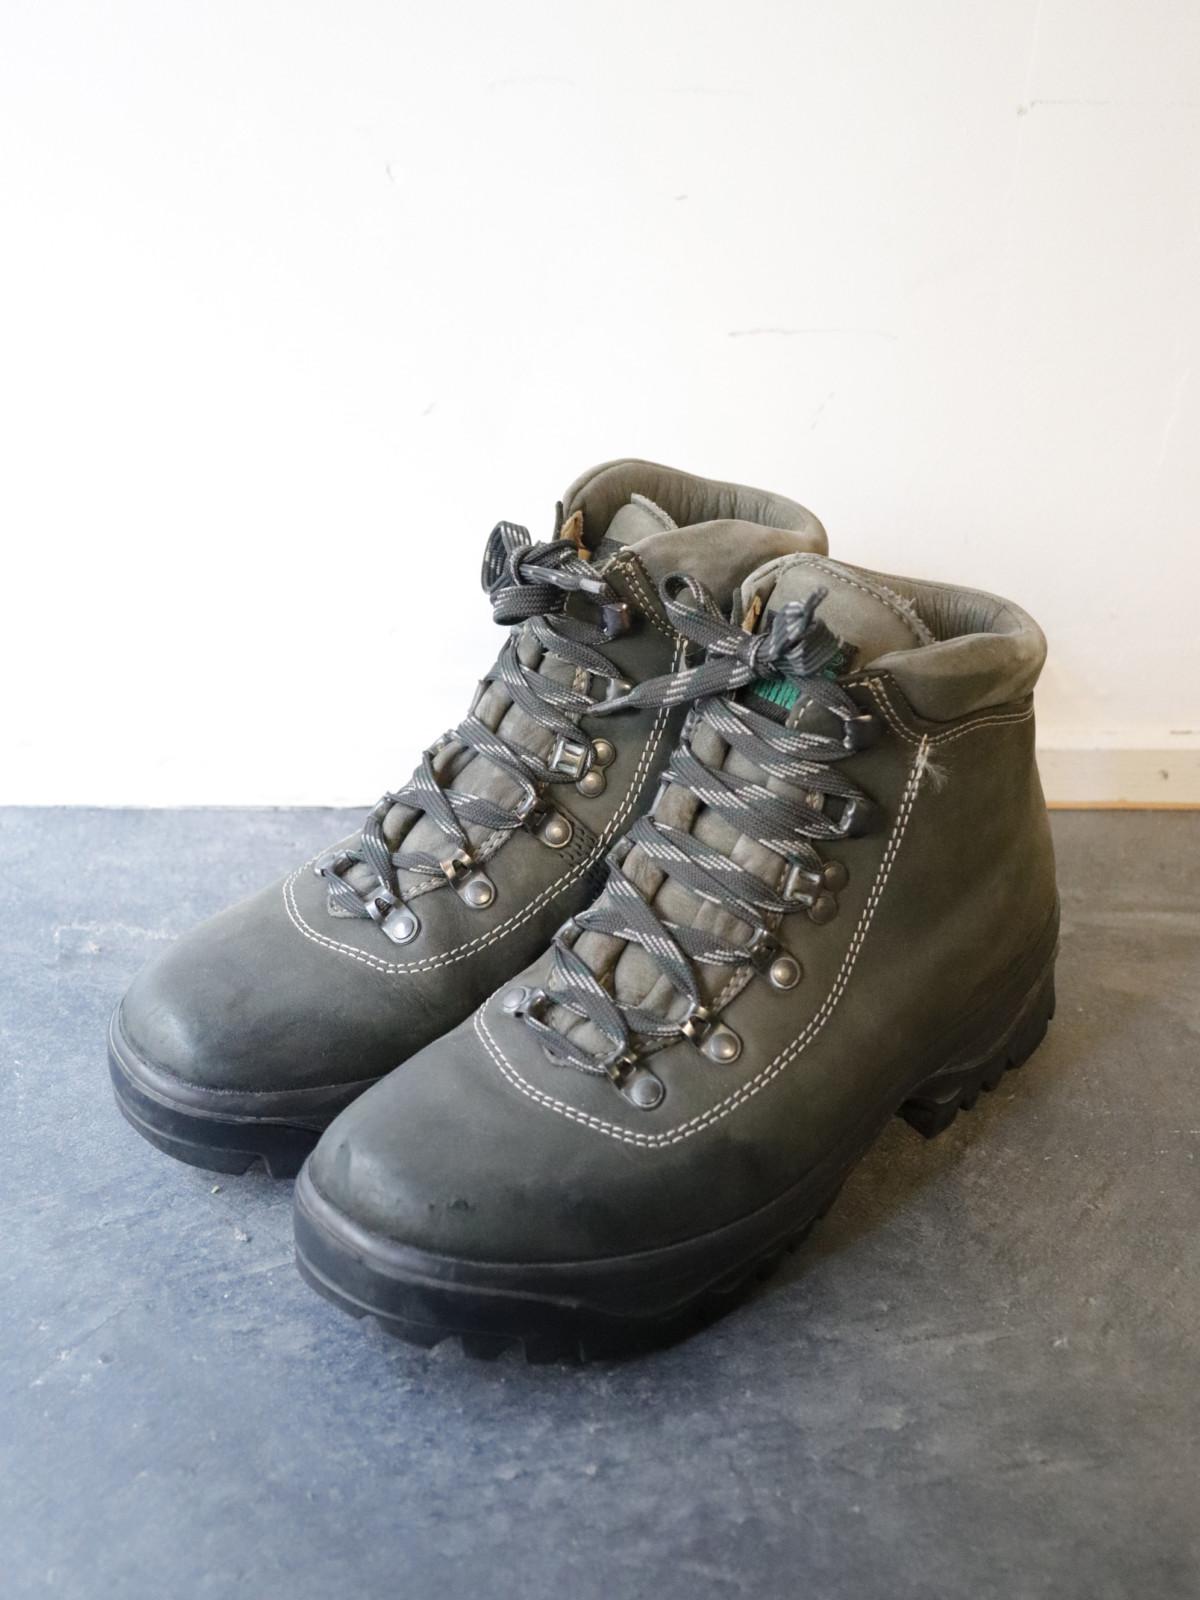 LIMMER,camp boots,Germany,vintage